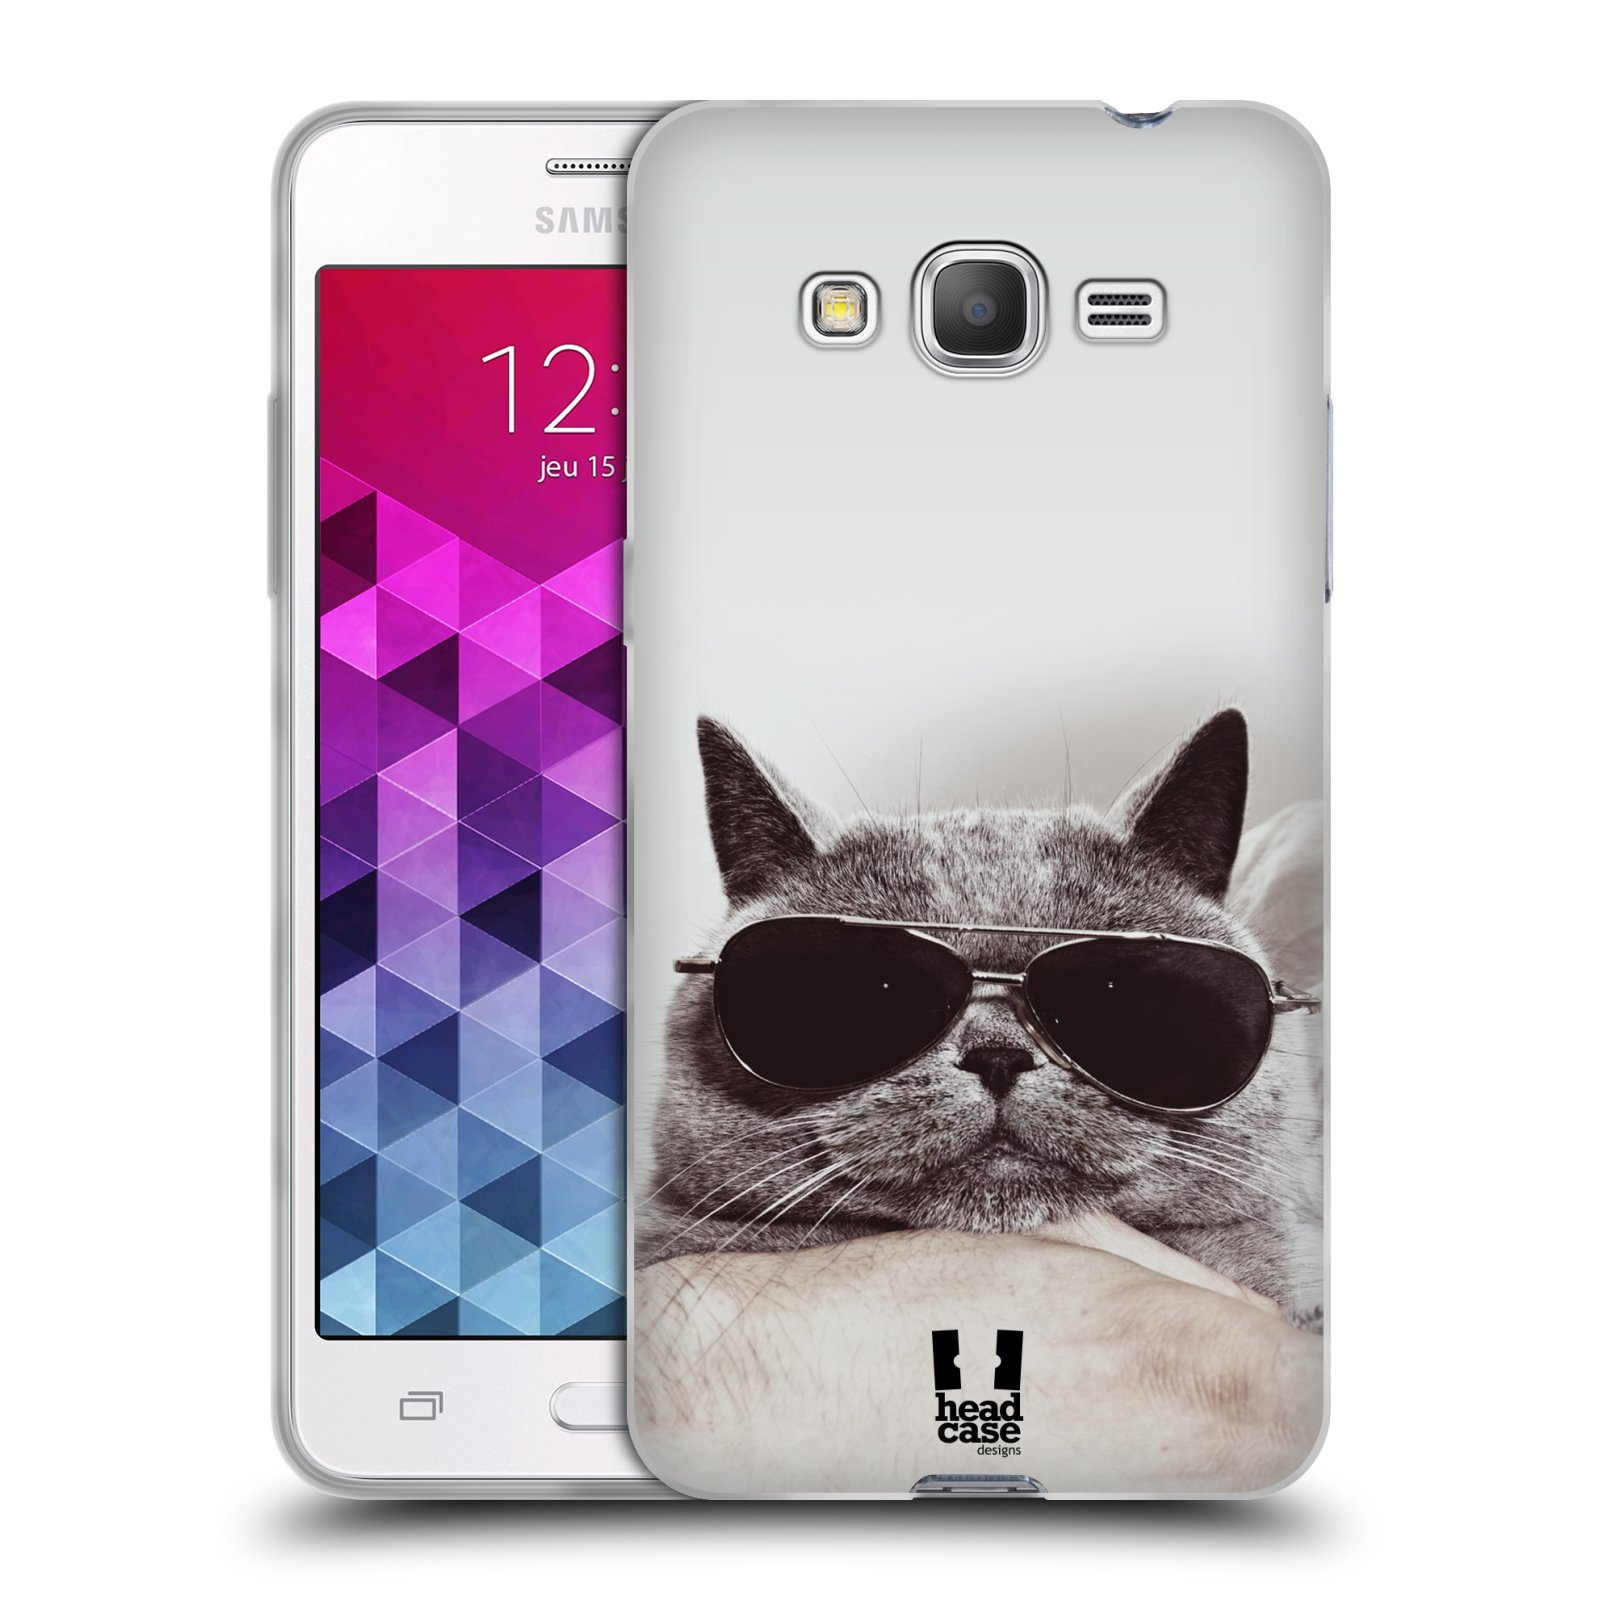 Silikonové pouzdro na mobil Samsung Galaxy Grand Prime HEAD CASE KOTĚ S BRÝLEMI (Silikonový kryt či obal na mobilní telefon Samsung Galaxy Grand Prime SM-G530)